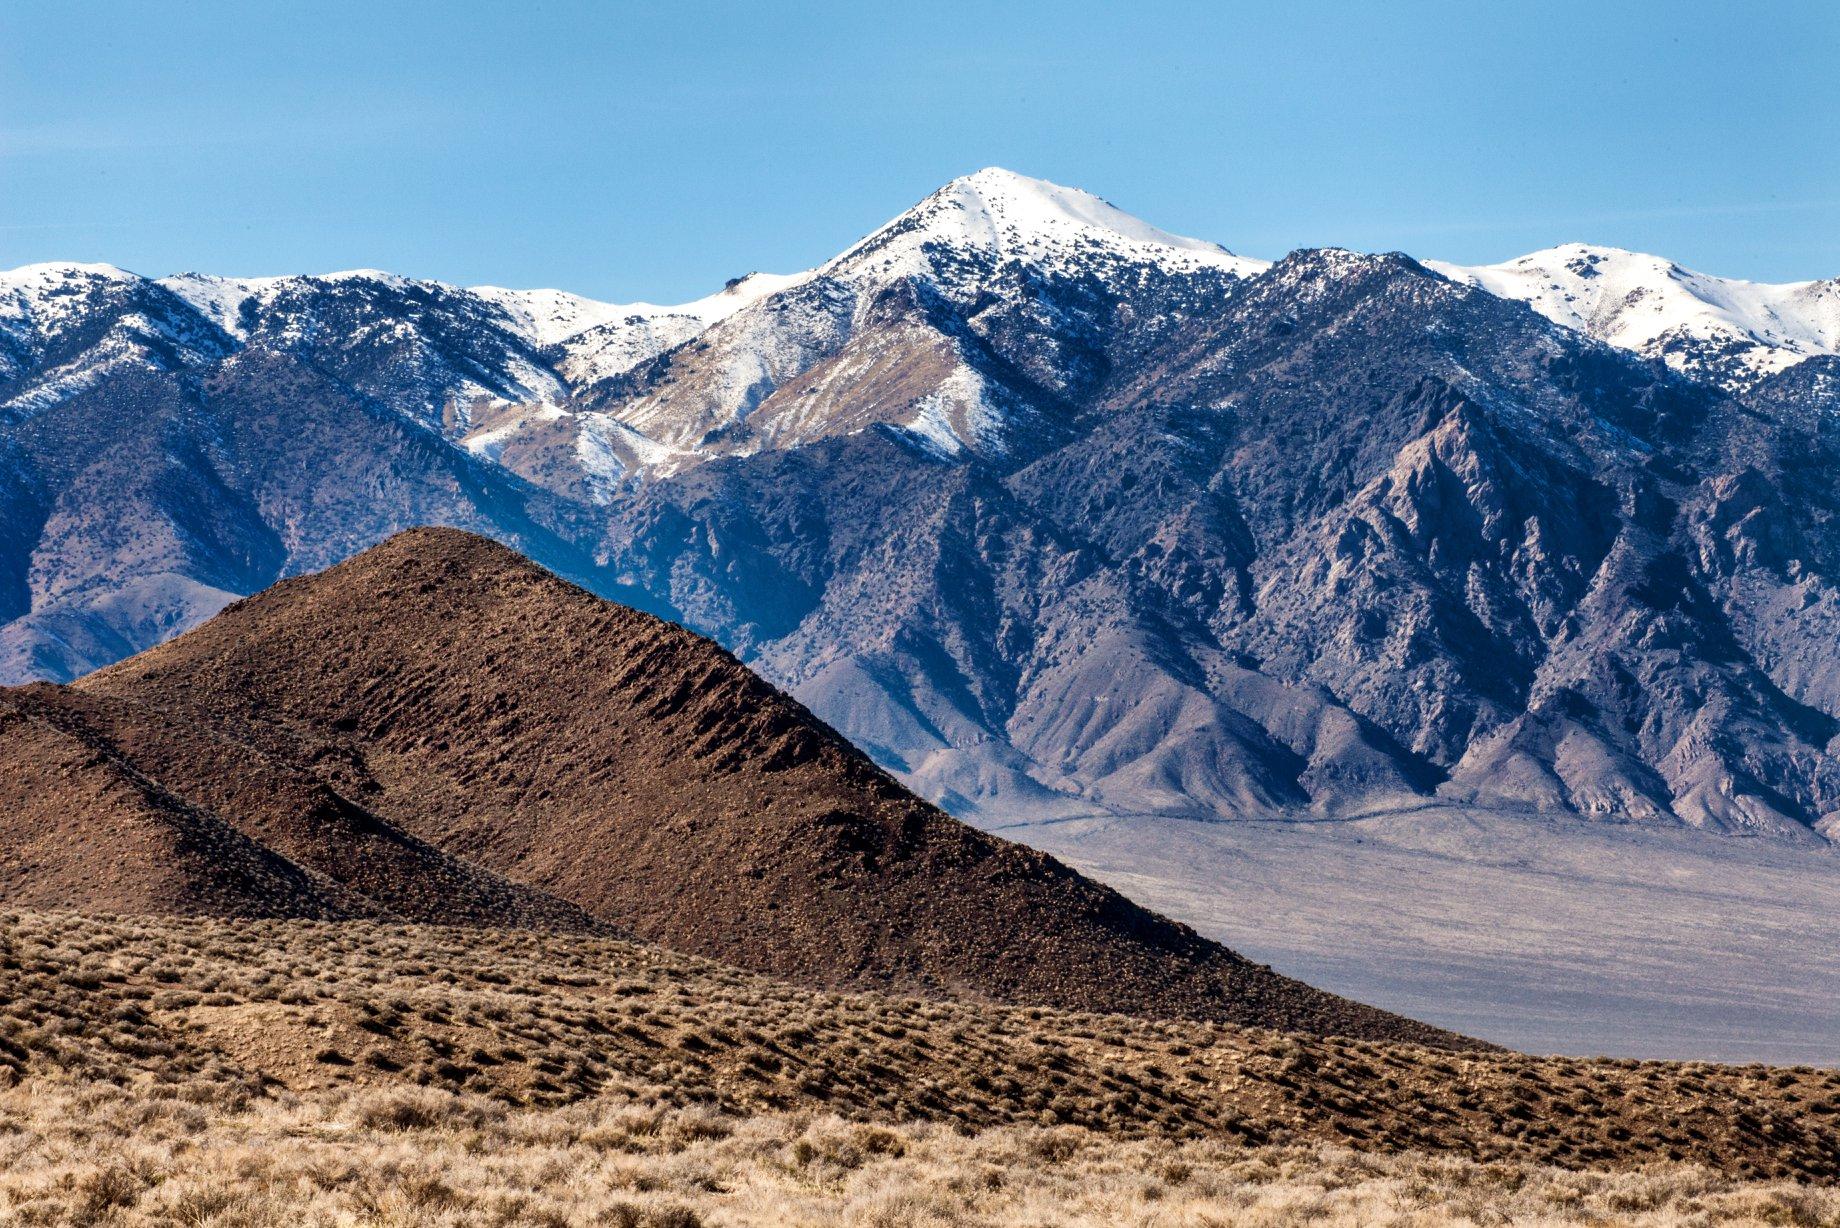 Job Peak Wilderness Study Area's snowy mountains.